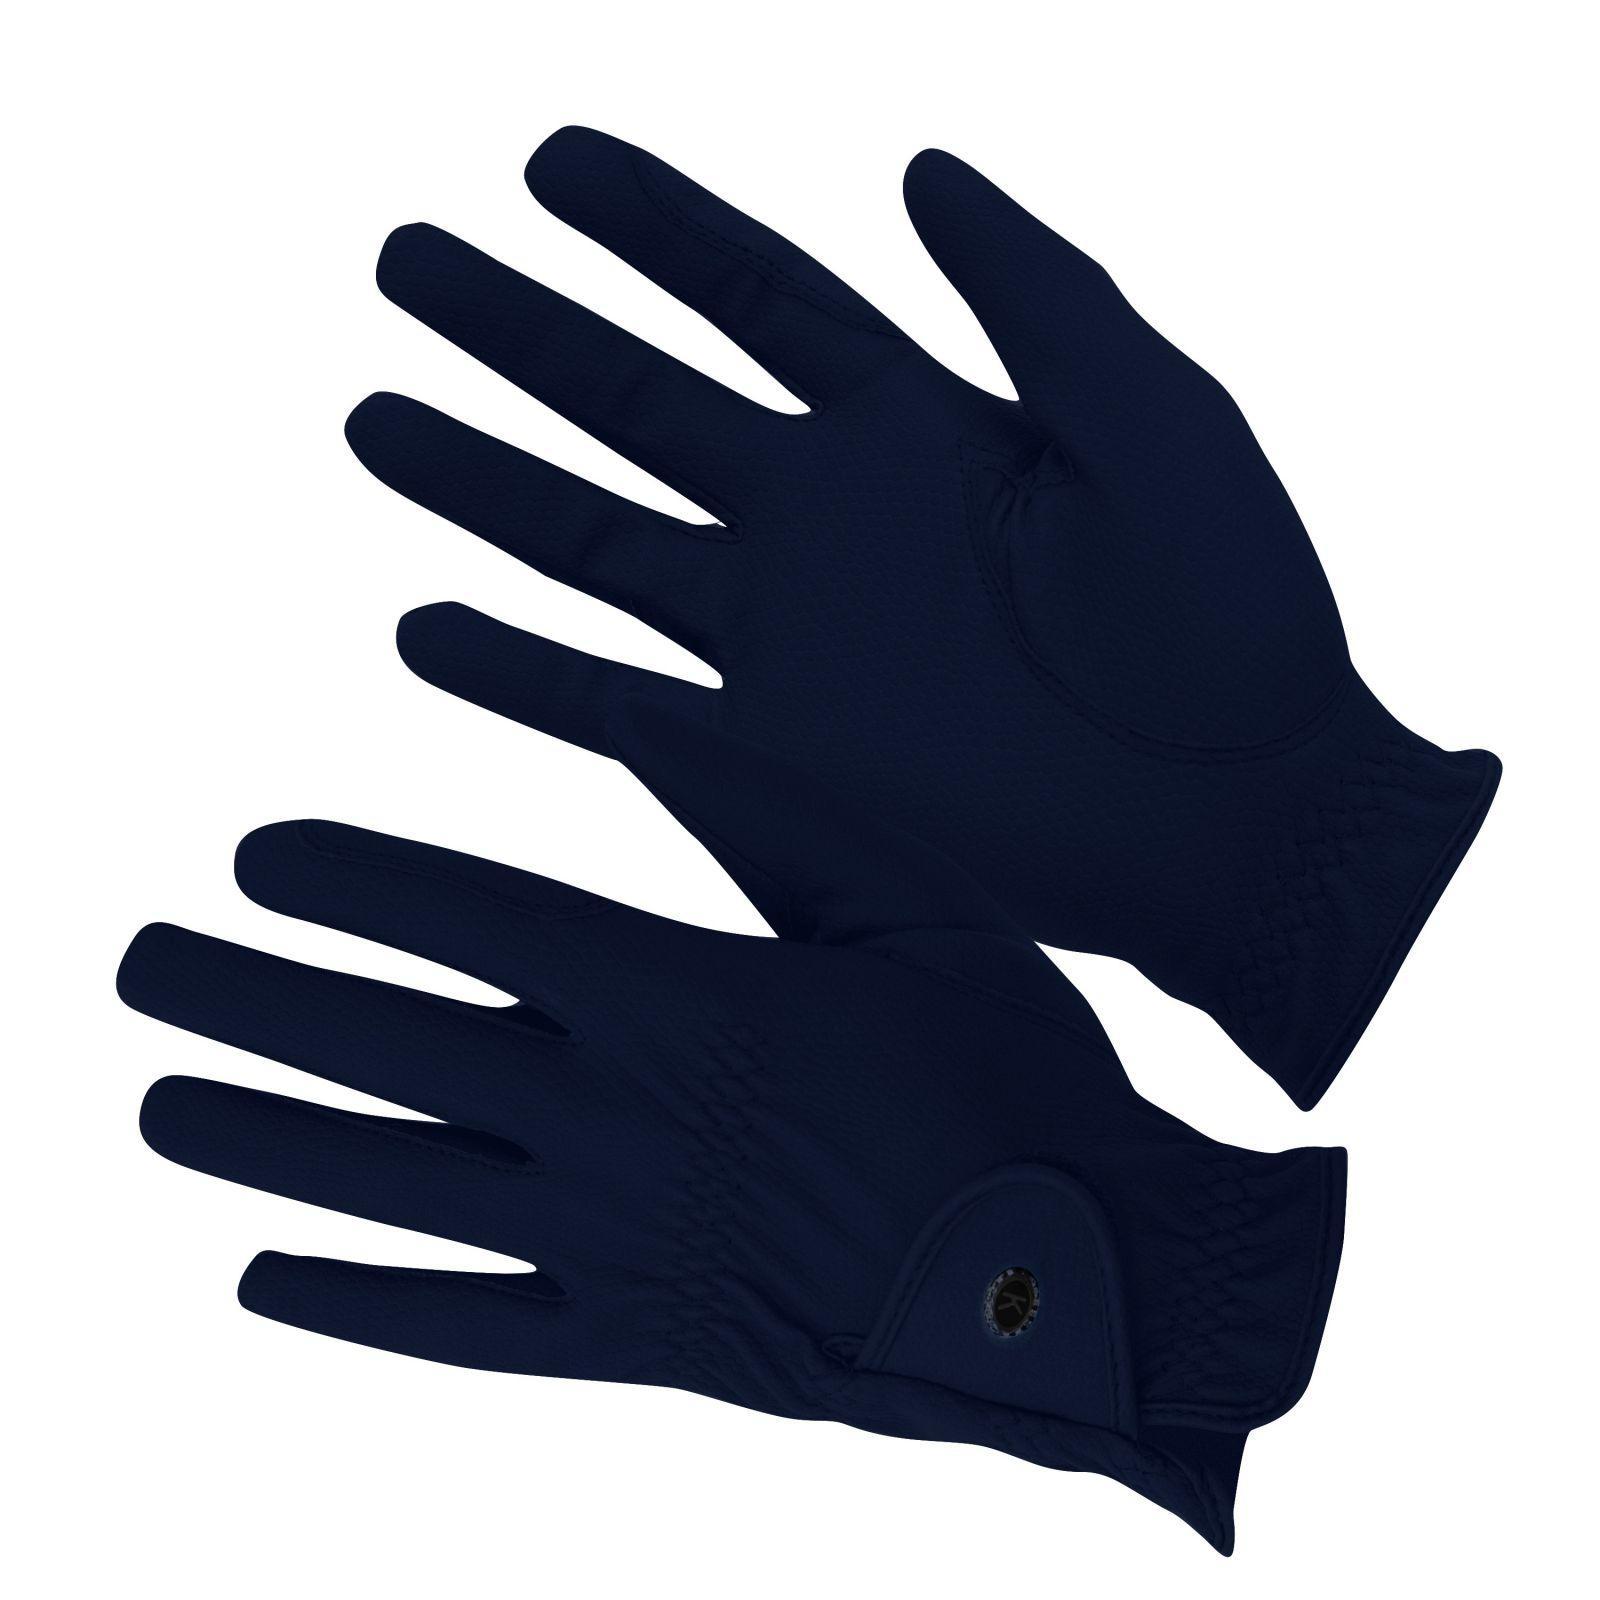 KM Elite ProGrip Gloves Navy Blue